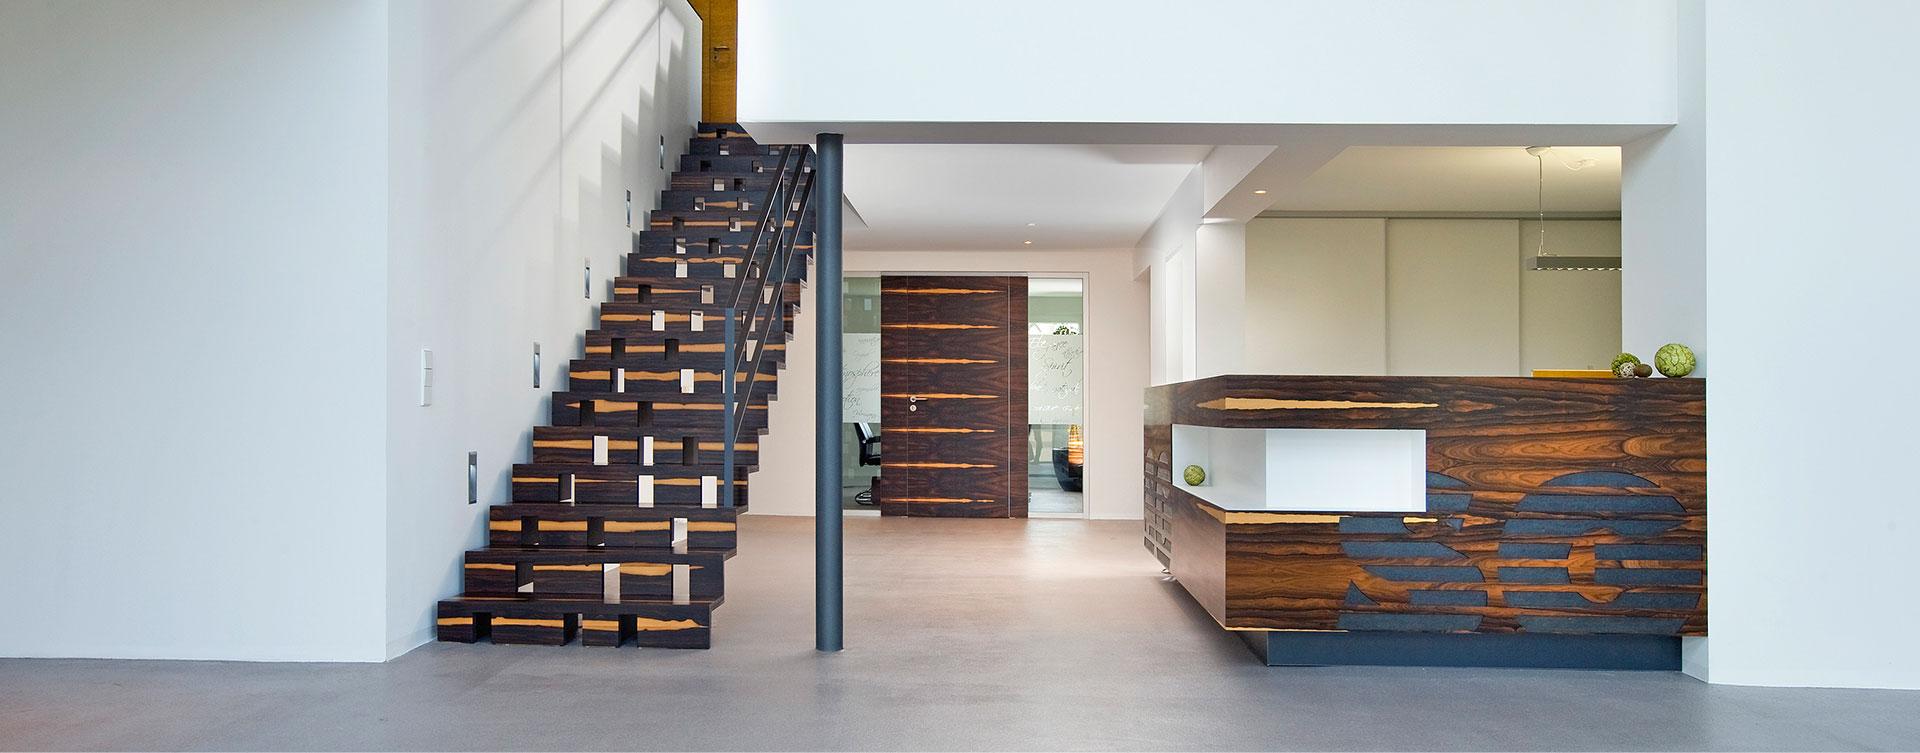 impressum schorn groh furniere veneers. Black Bedroom Furniture Sets. Home Design Ideas